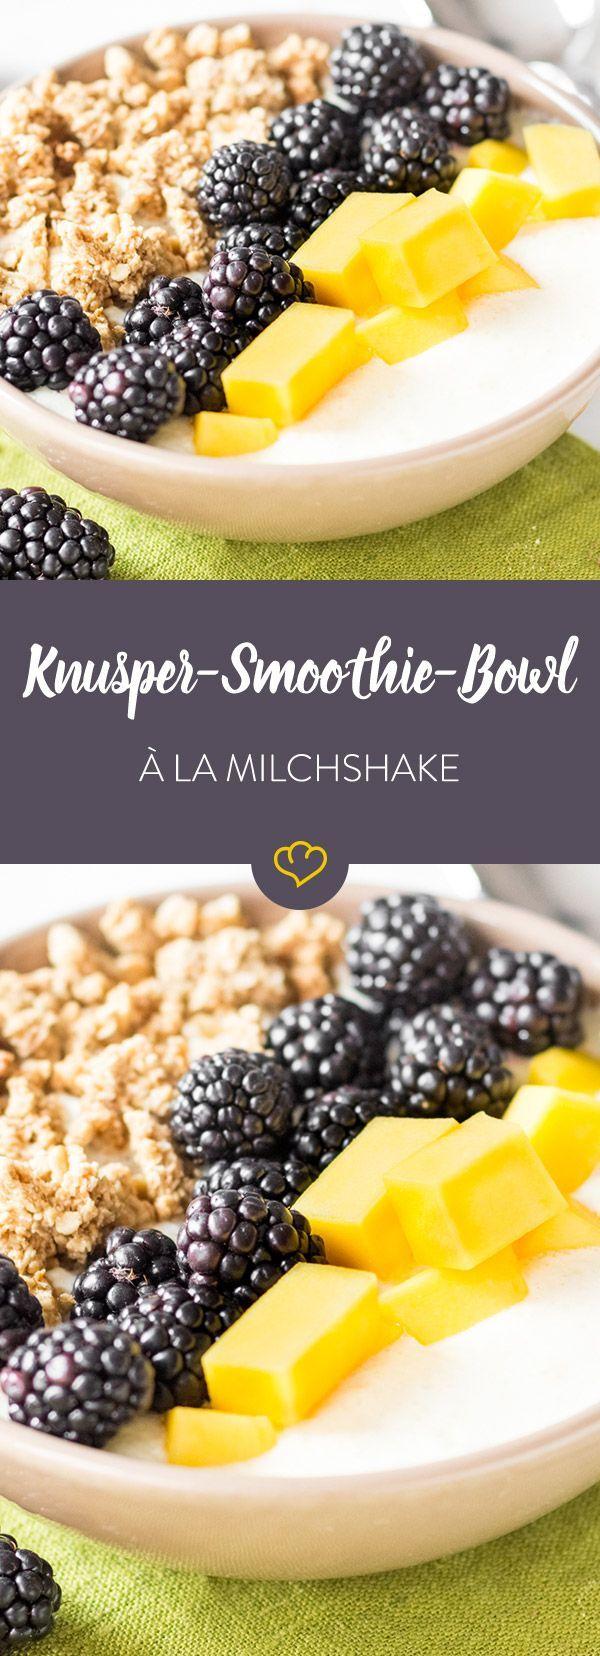 pfirsich knusper smoothie bowl la milchshake rezept. Black Bedroom Furniture Sets. Home Design Ideas